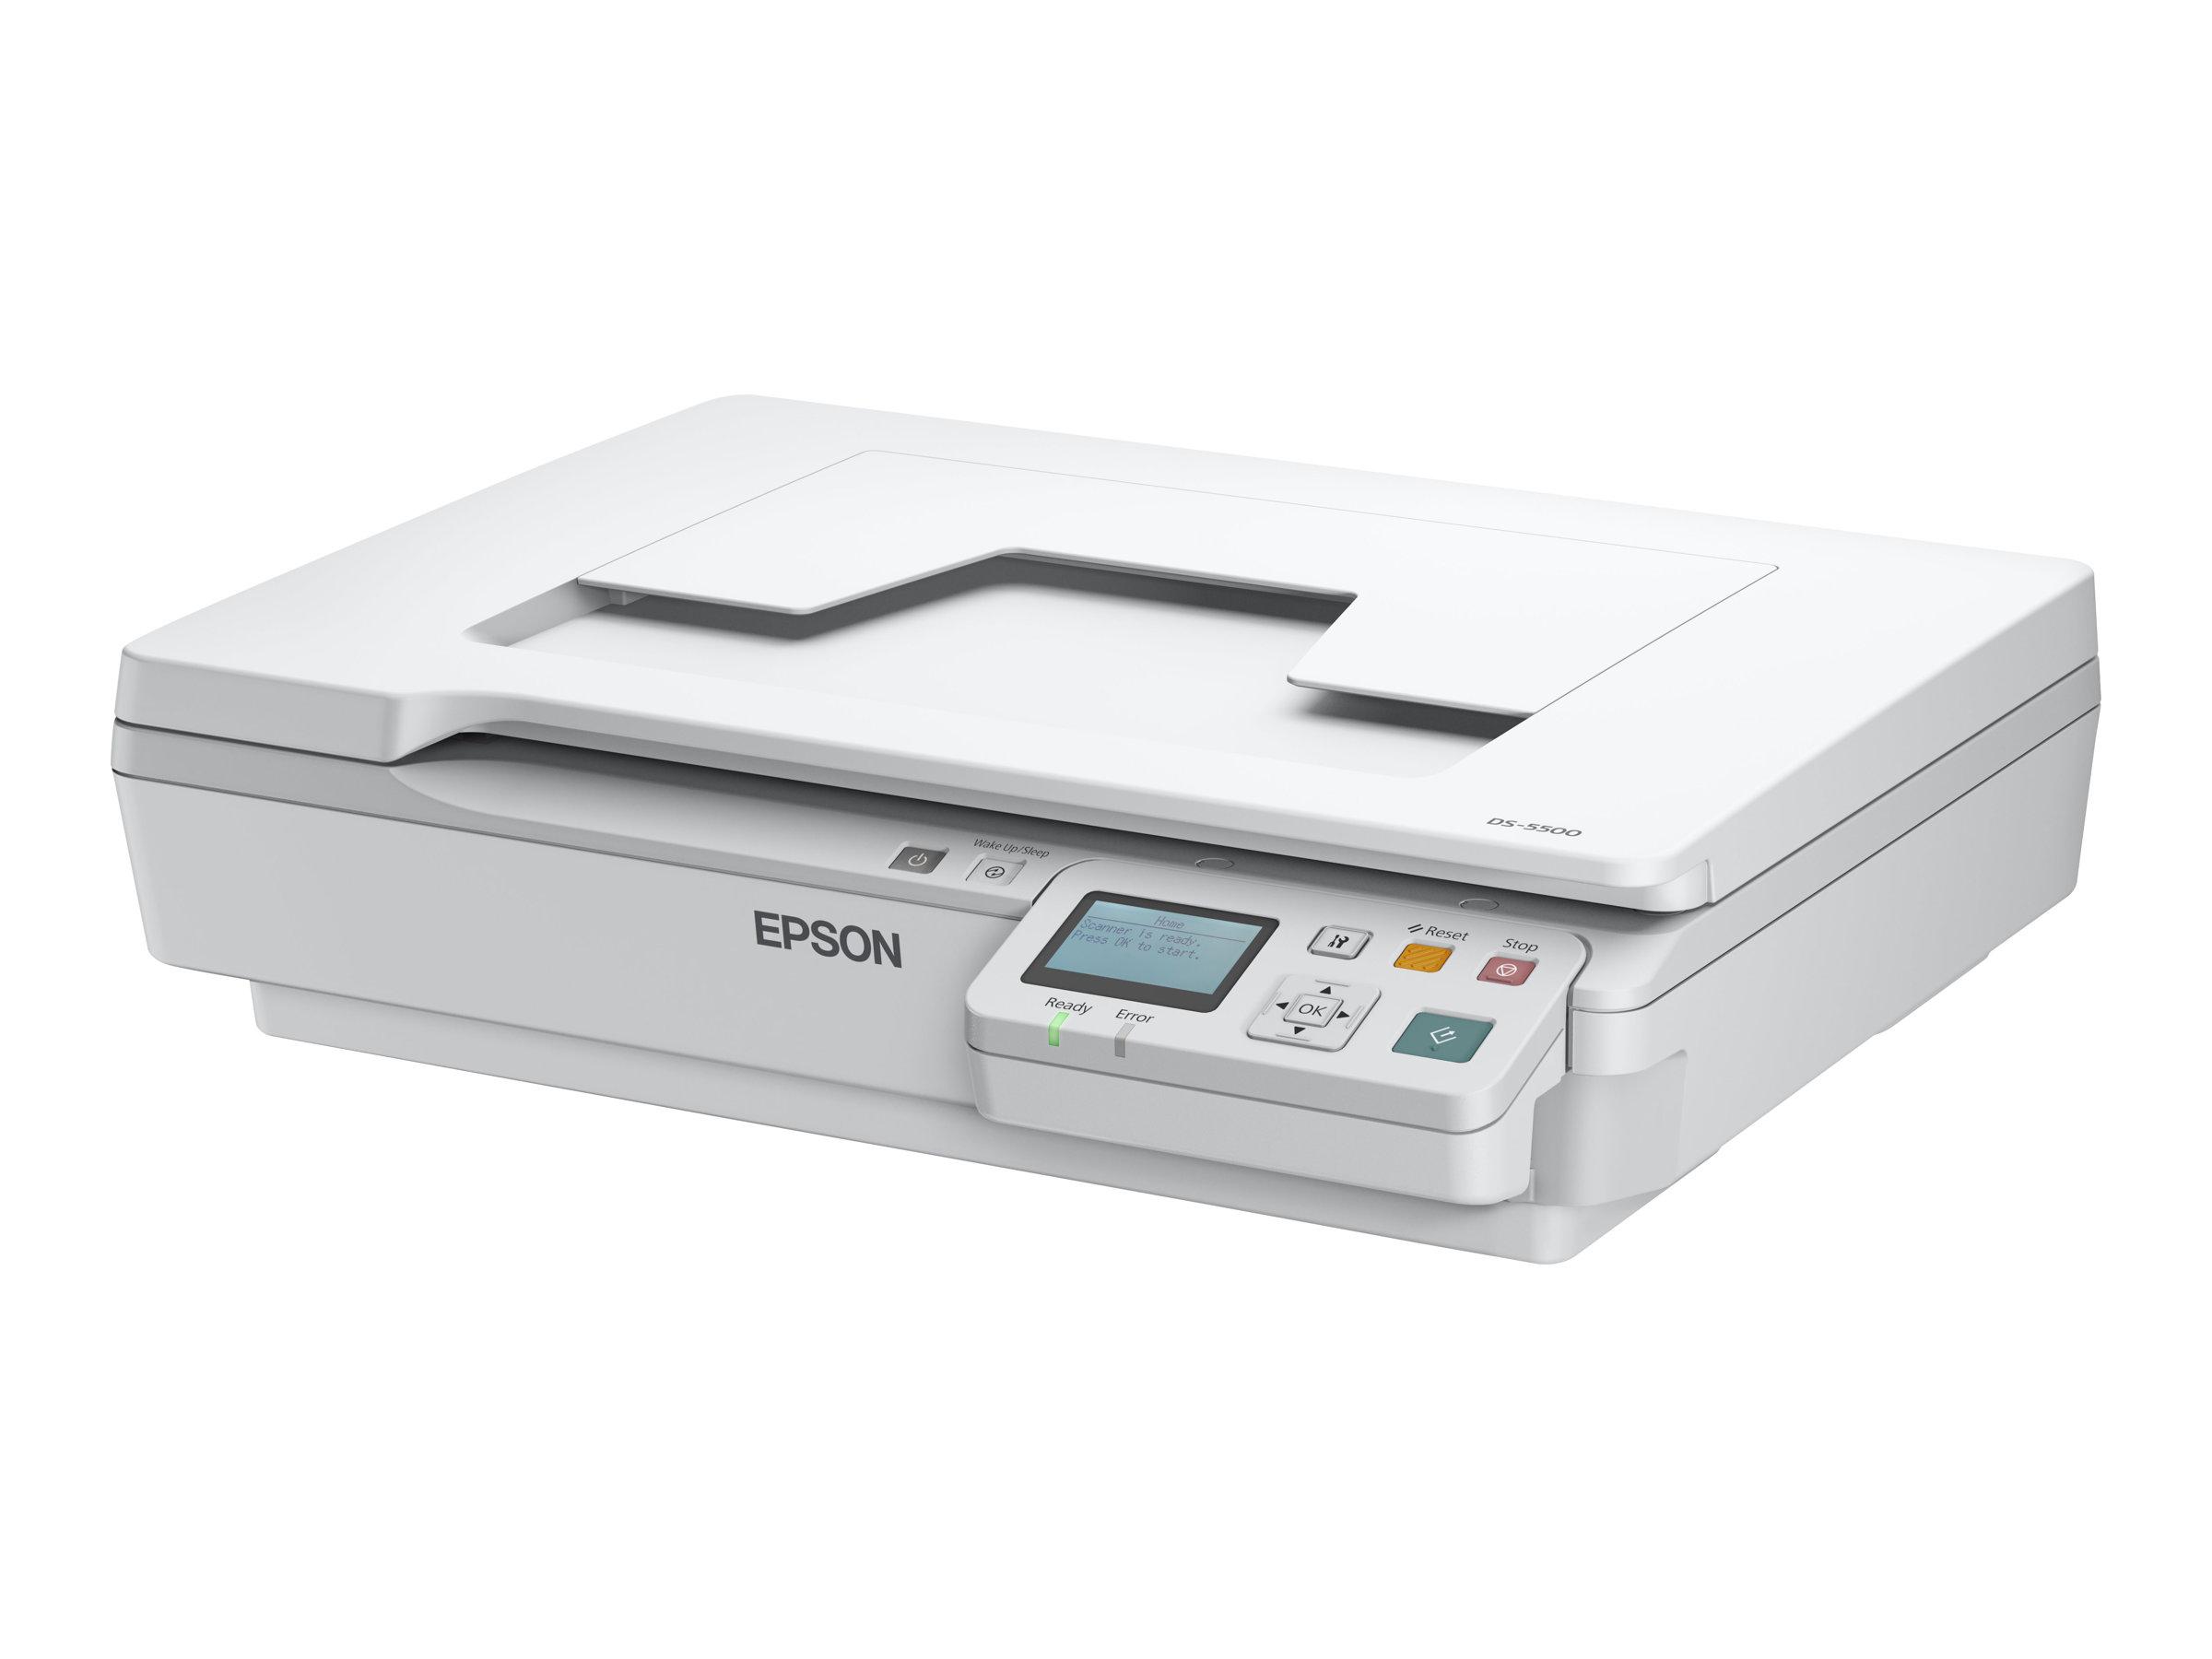 Epson WorkForce DS-5500N - Flachbettscanner - A4